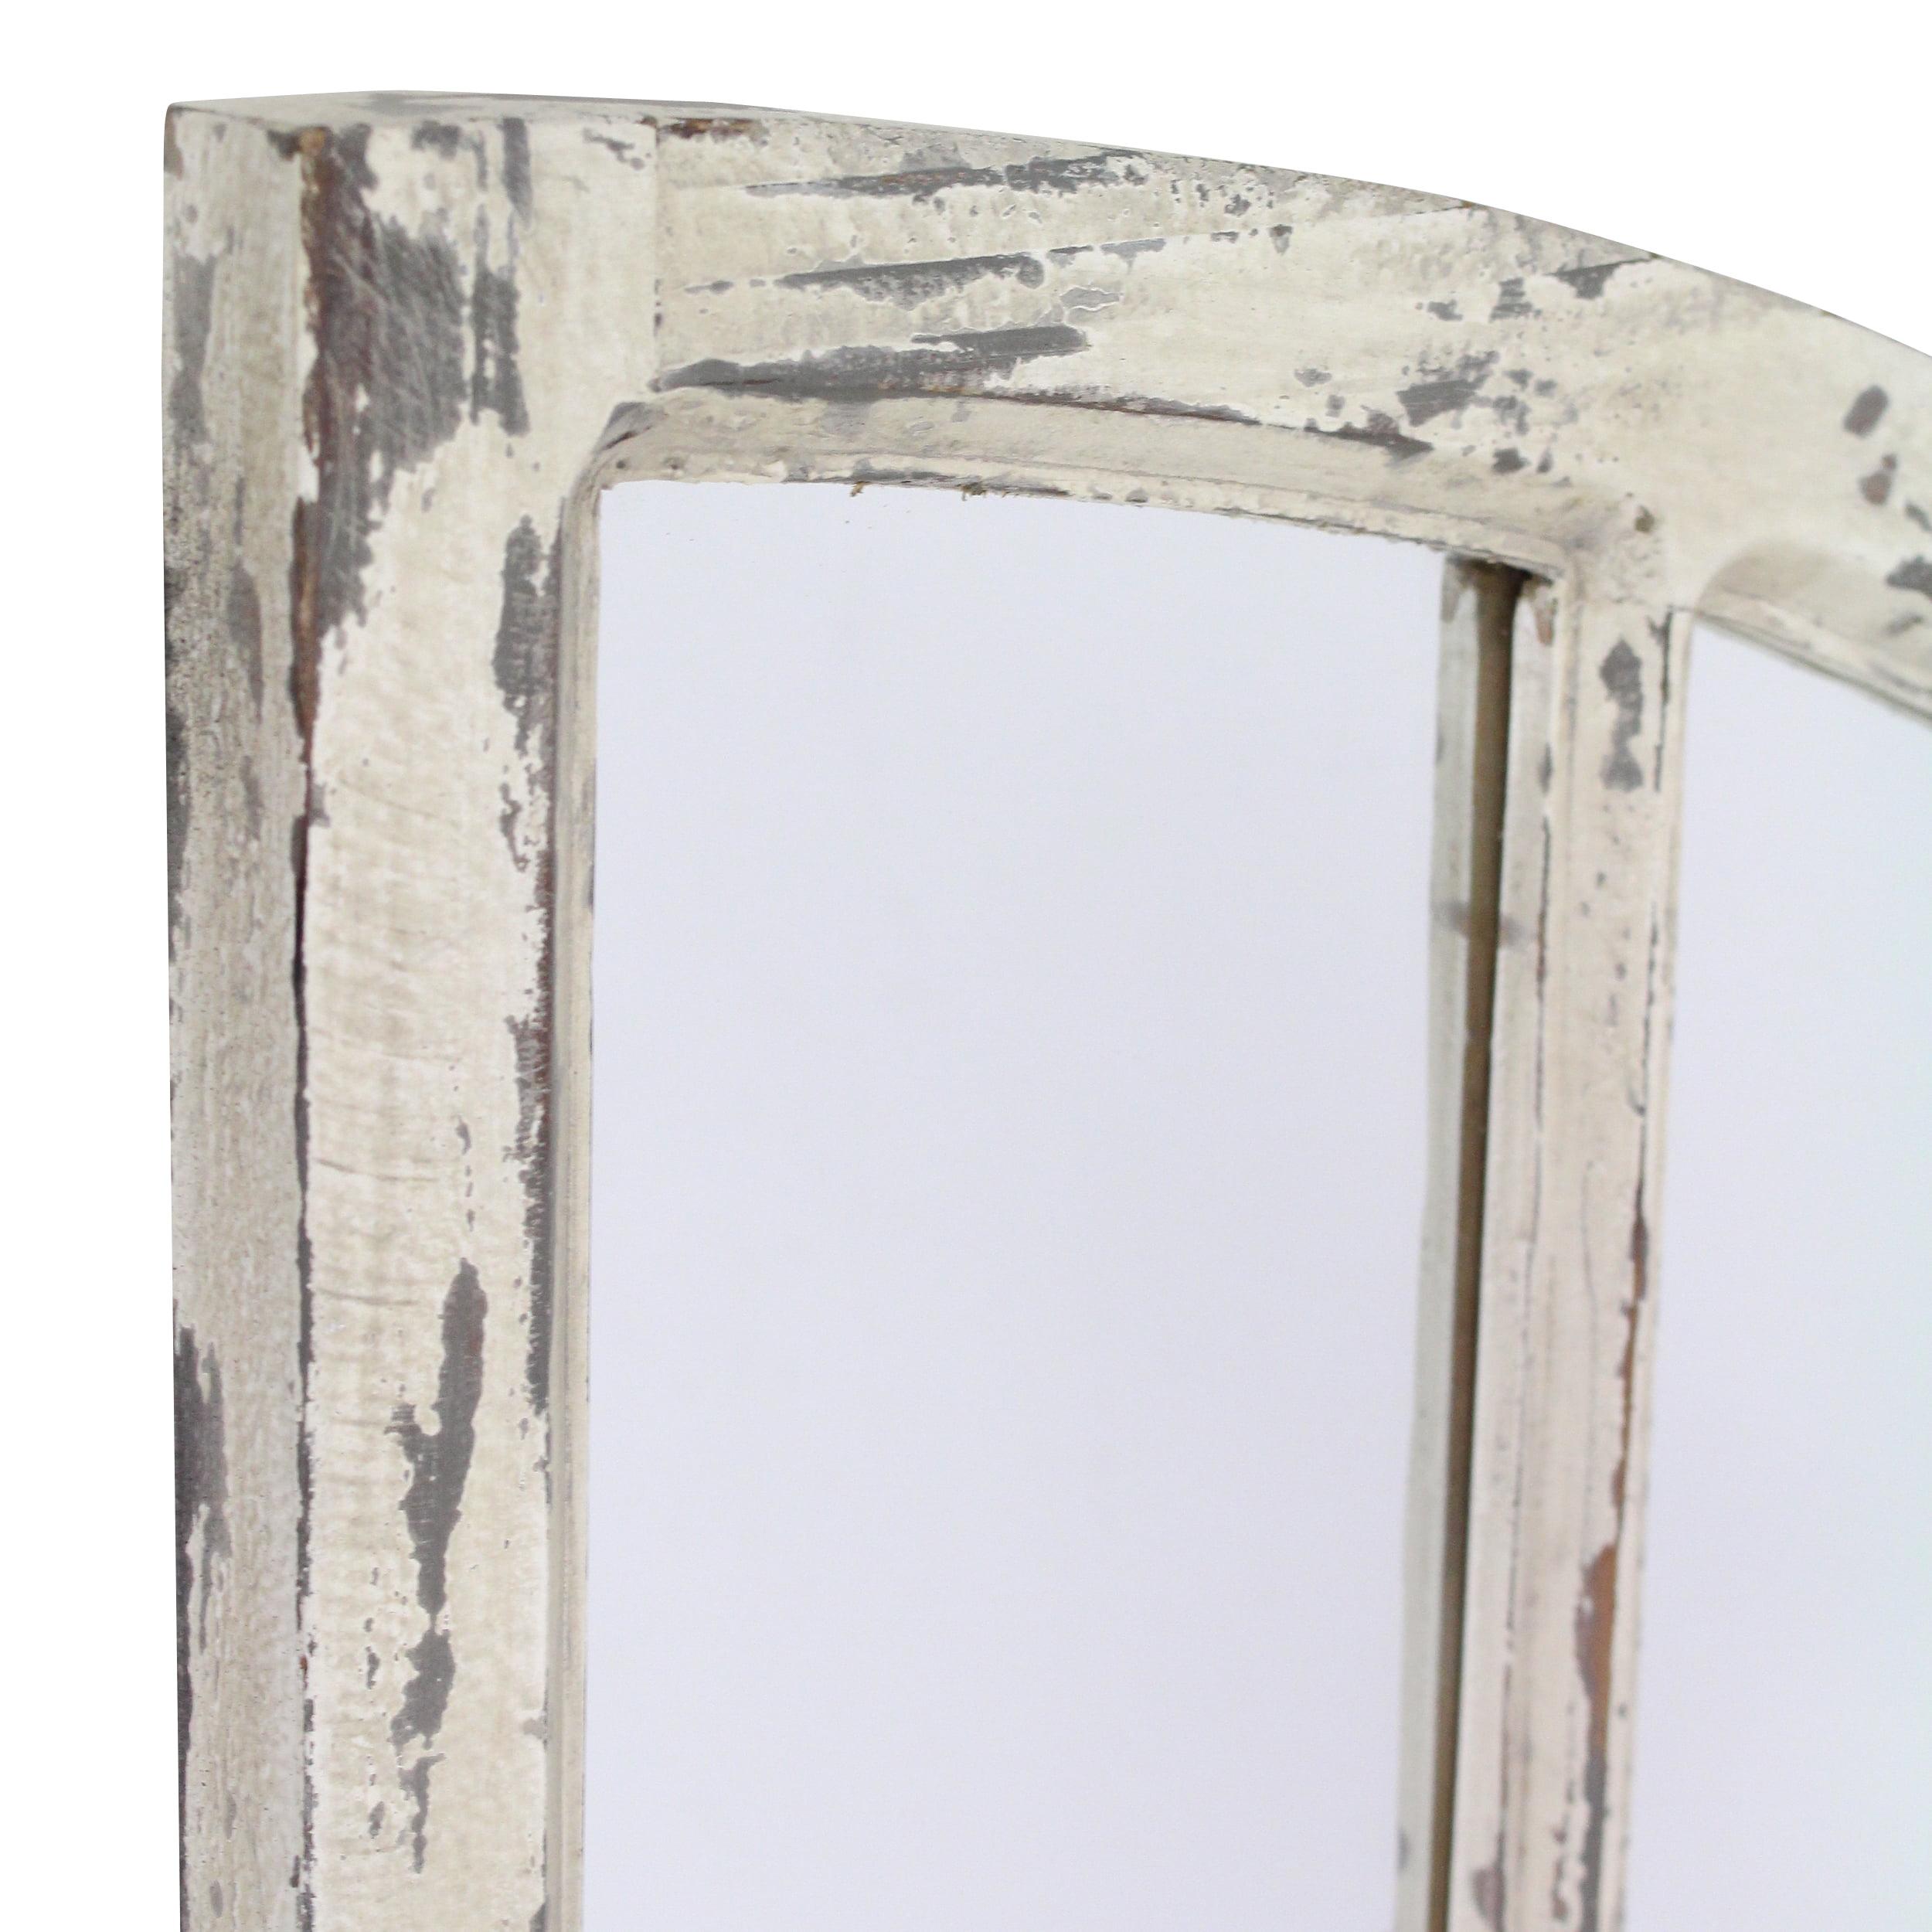 Jolene Arch Window Pane Mirrors Off White 27 X 15 Set Of 2 By Aspire Walmart Com Walmart Com